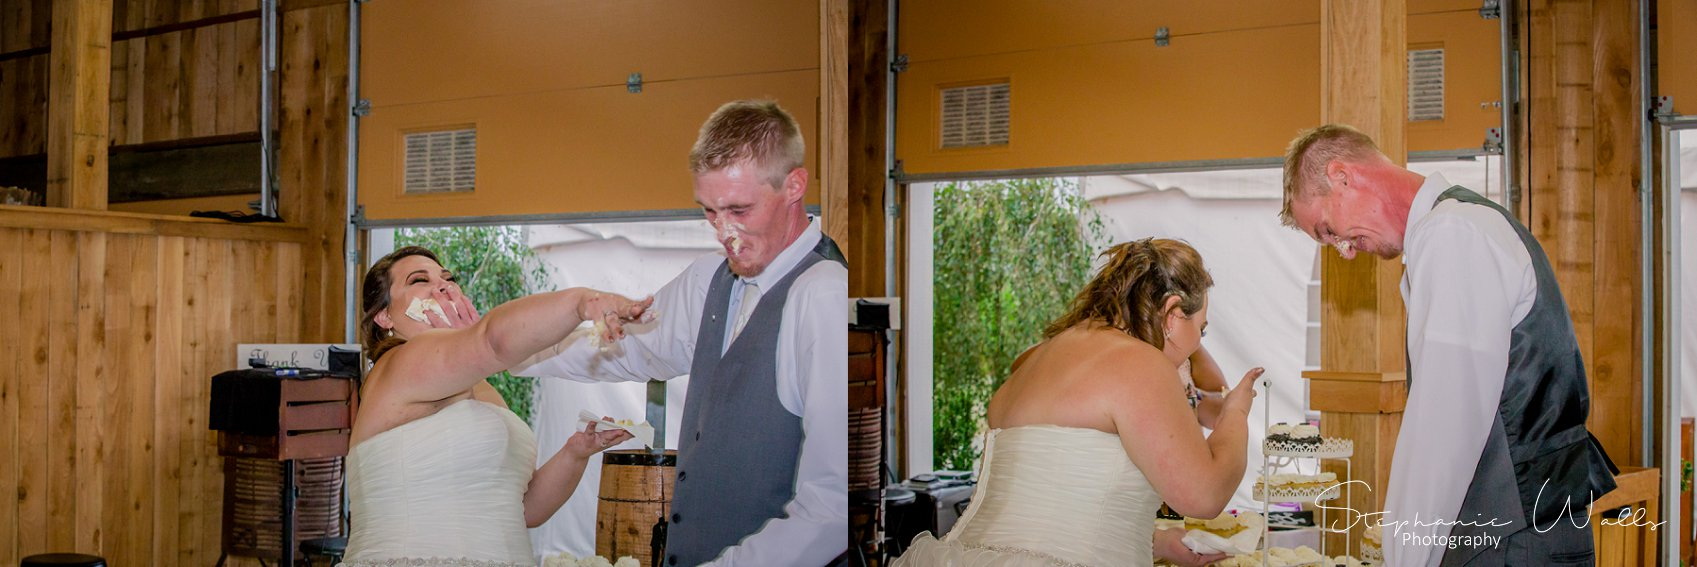 Kimble Wedding 086 1 Marlena & Allans | Snohomish Red Barn Events (Stocker Farms) | Snohomish, Wa Wedding Photographer